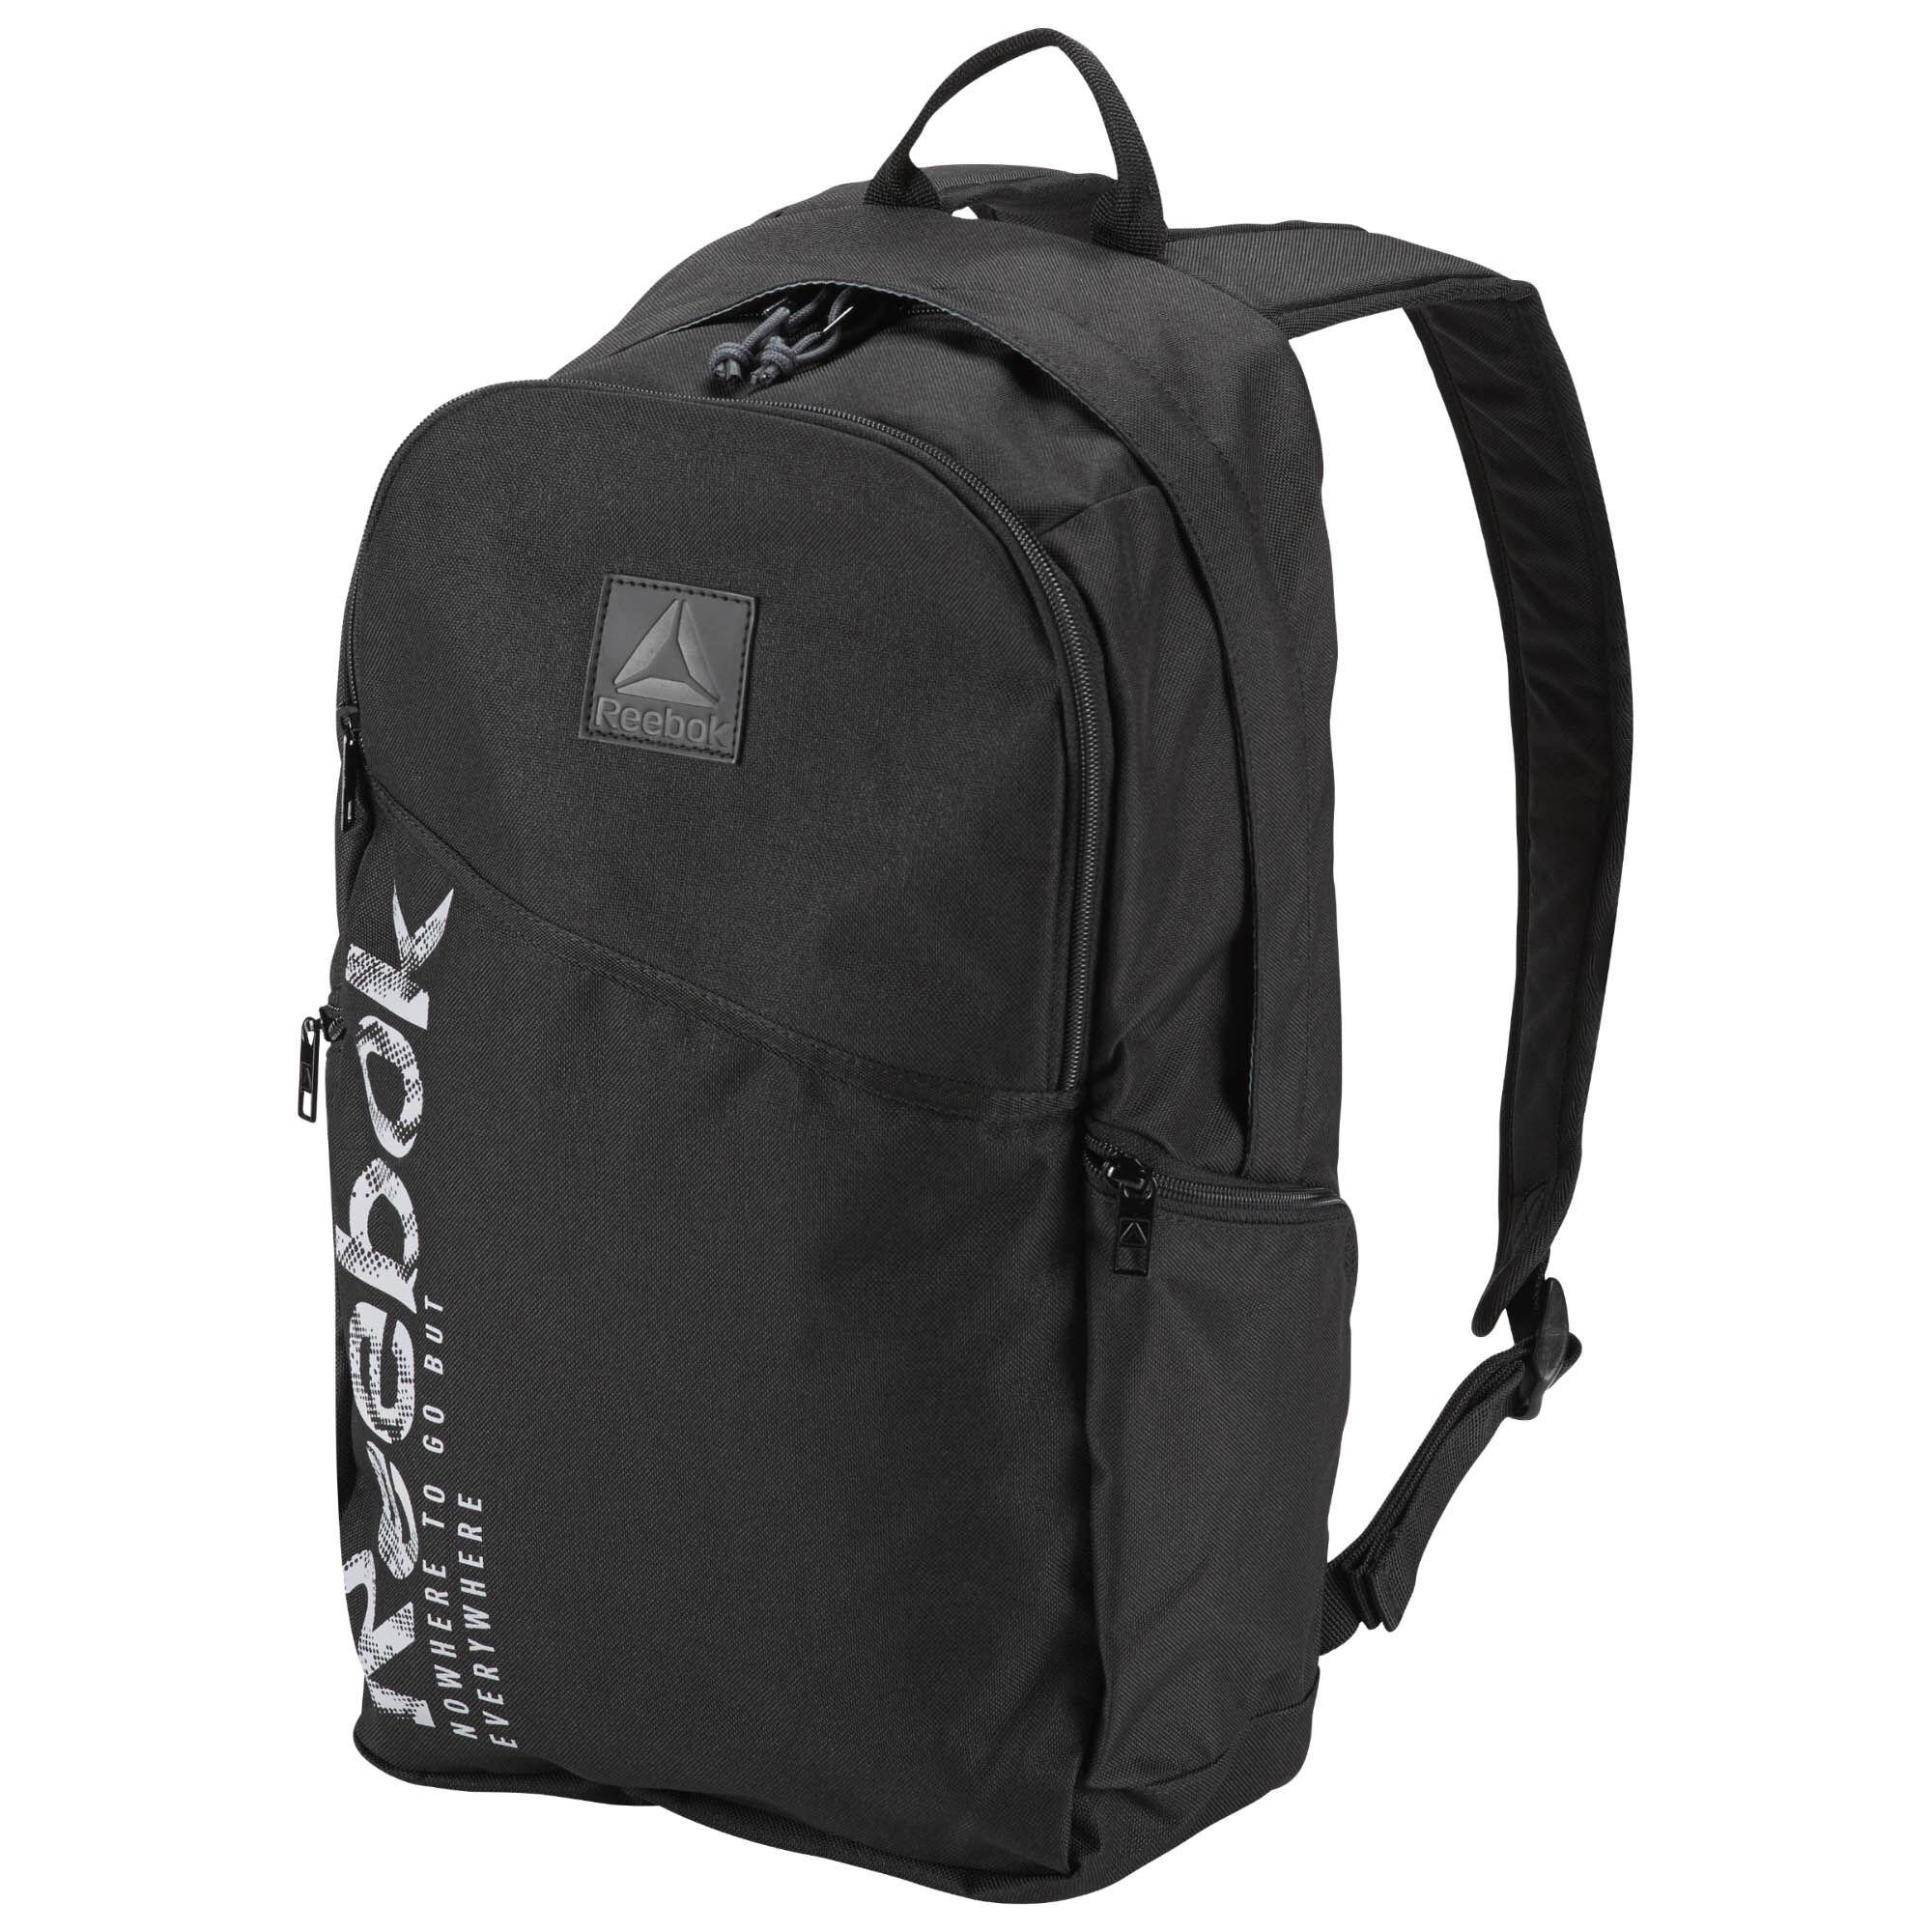 Reebok - Reebok Choice Mini Backpack, Black - Walmart.com ...  |Reebok Backpack